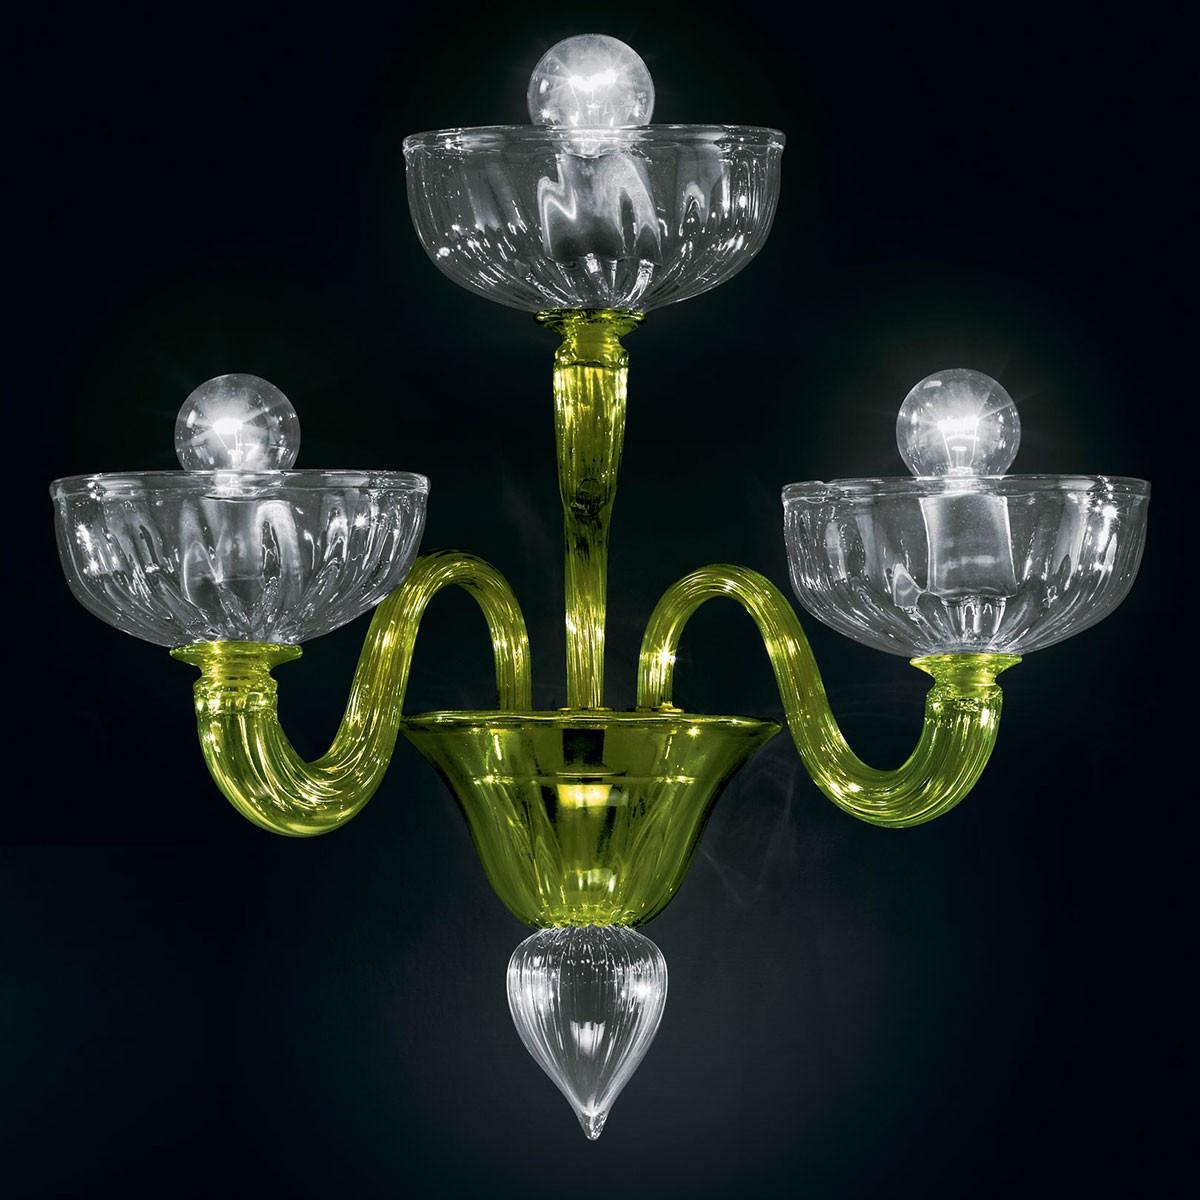 """Andronico"" Murano glas wandleuchte - 3 flammig - grün und transparente"